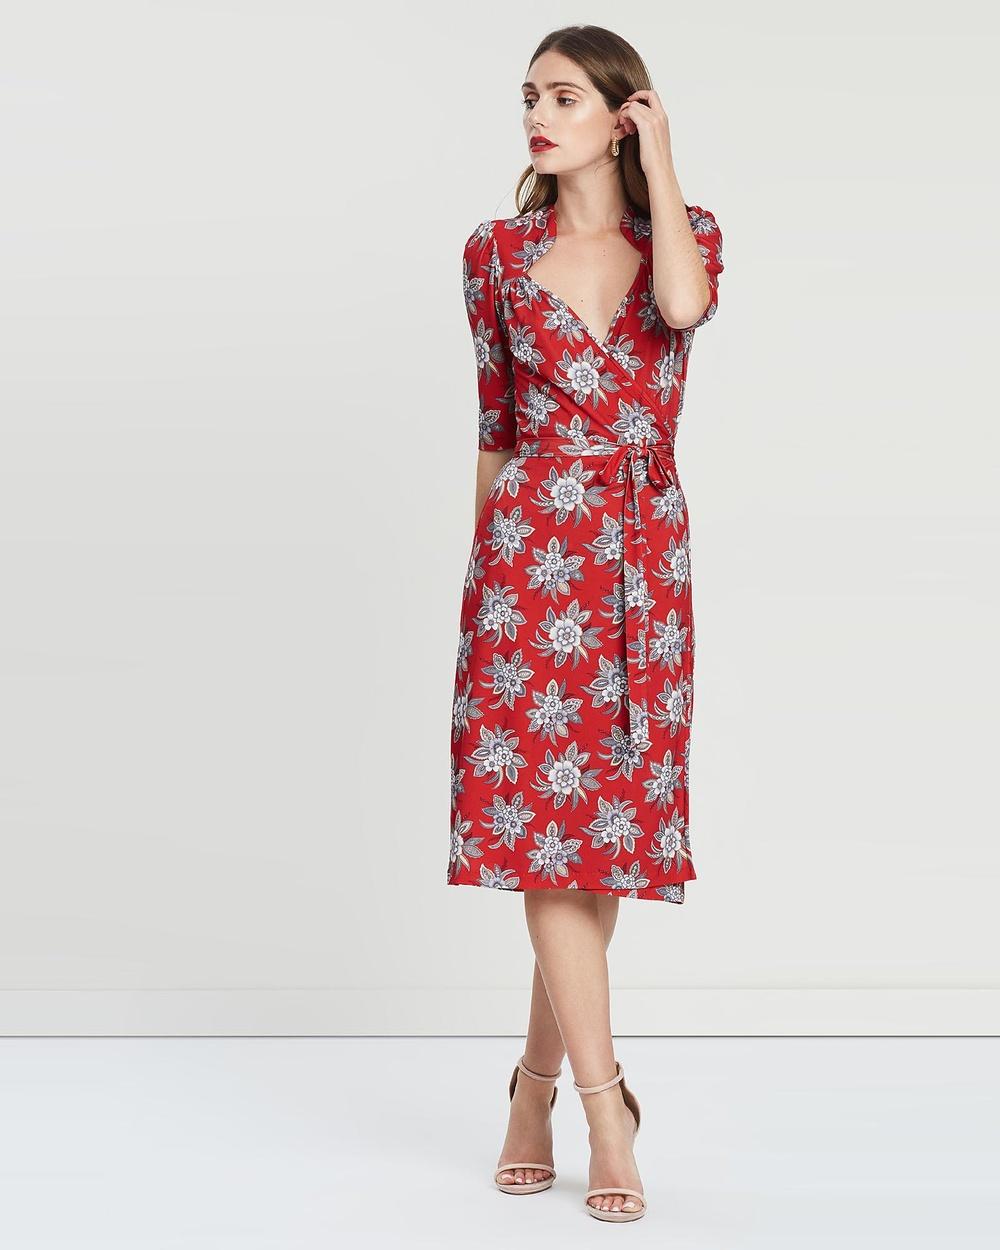 Leona Edmiston RTW Posey Floral Daisy Wrap Dress